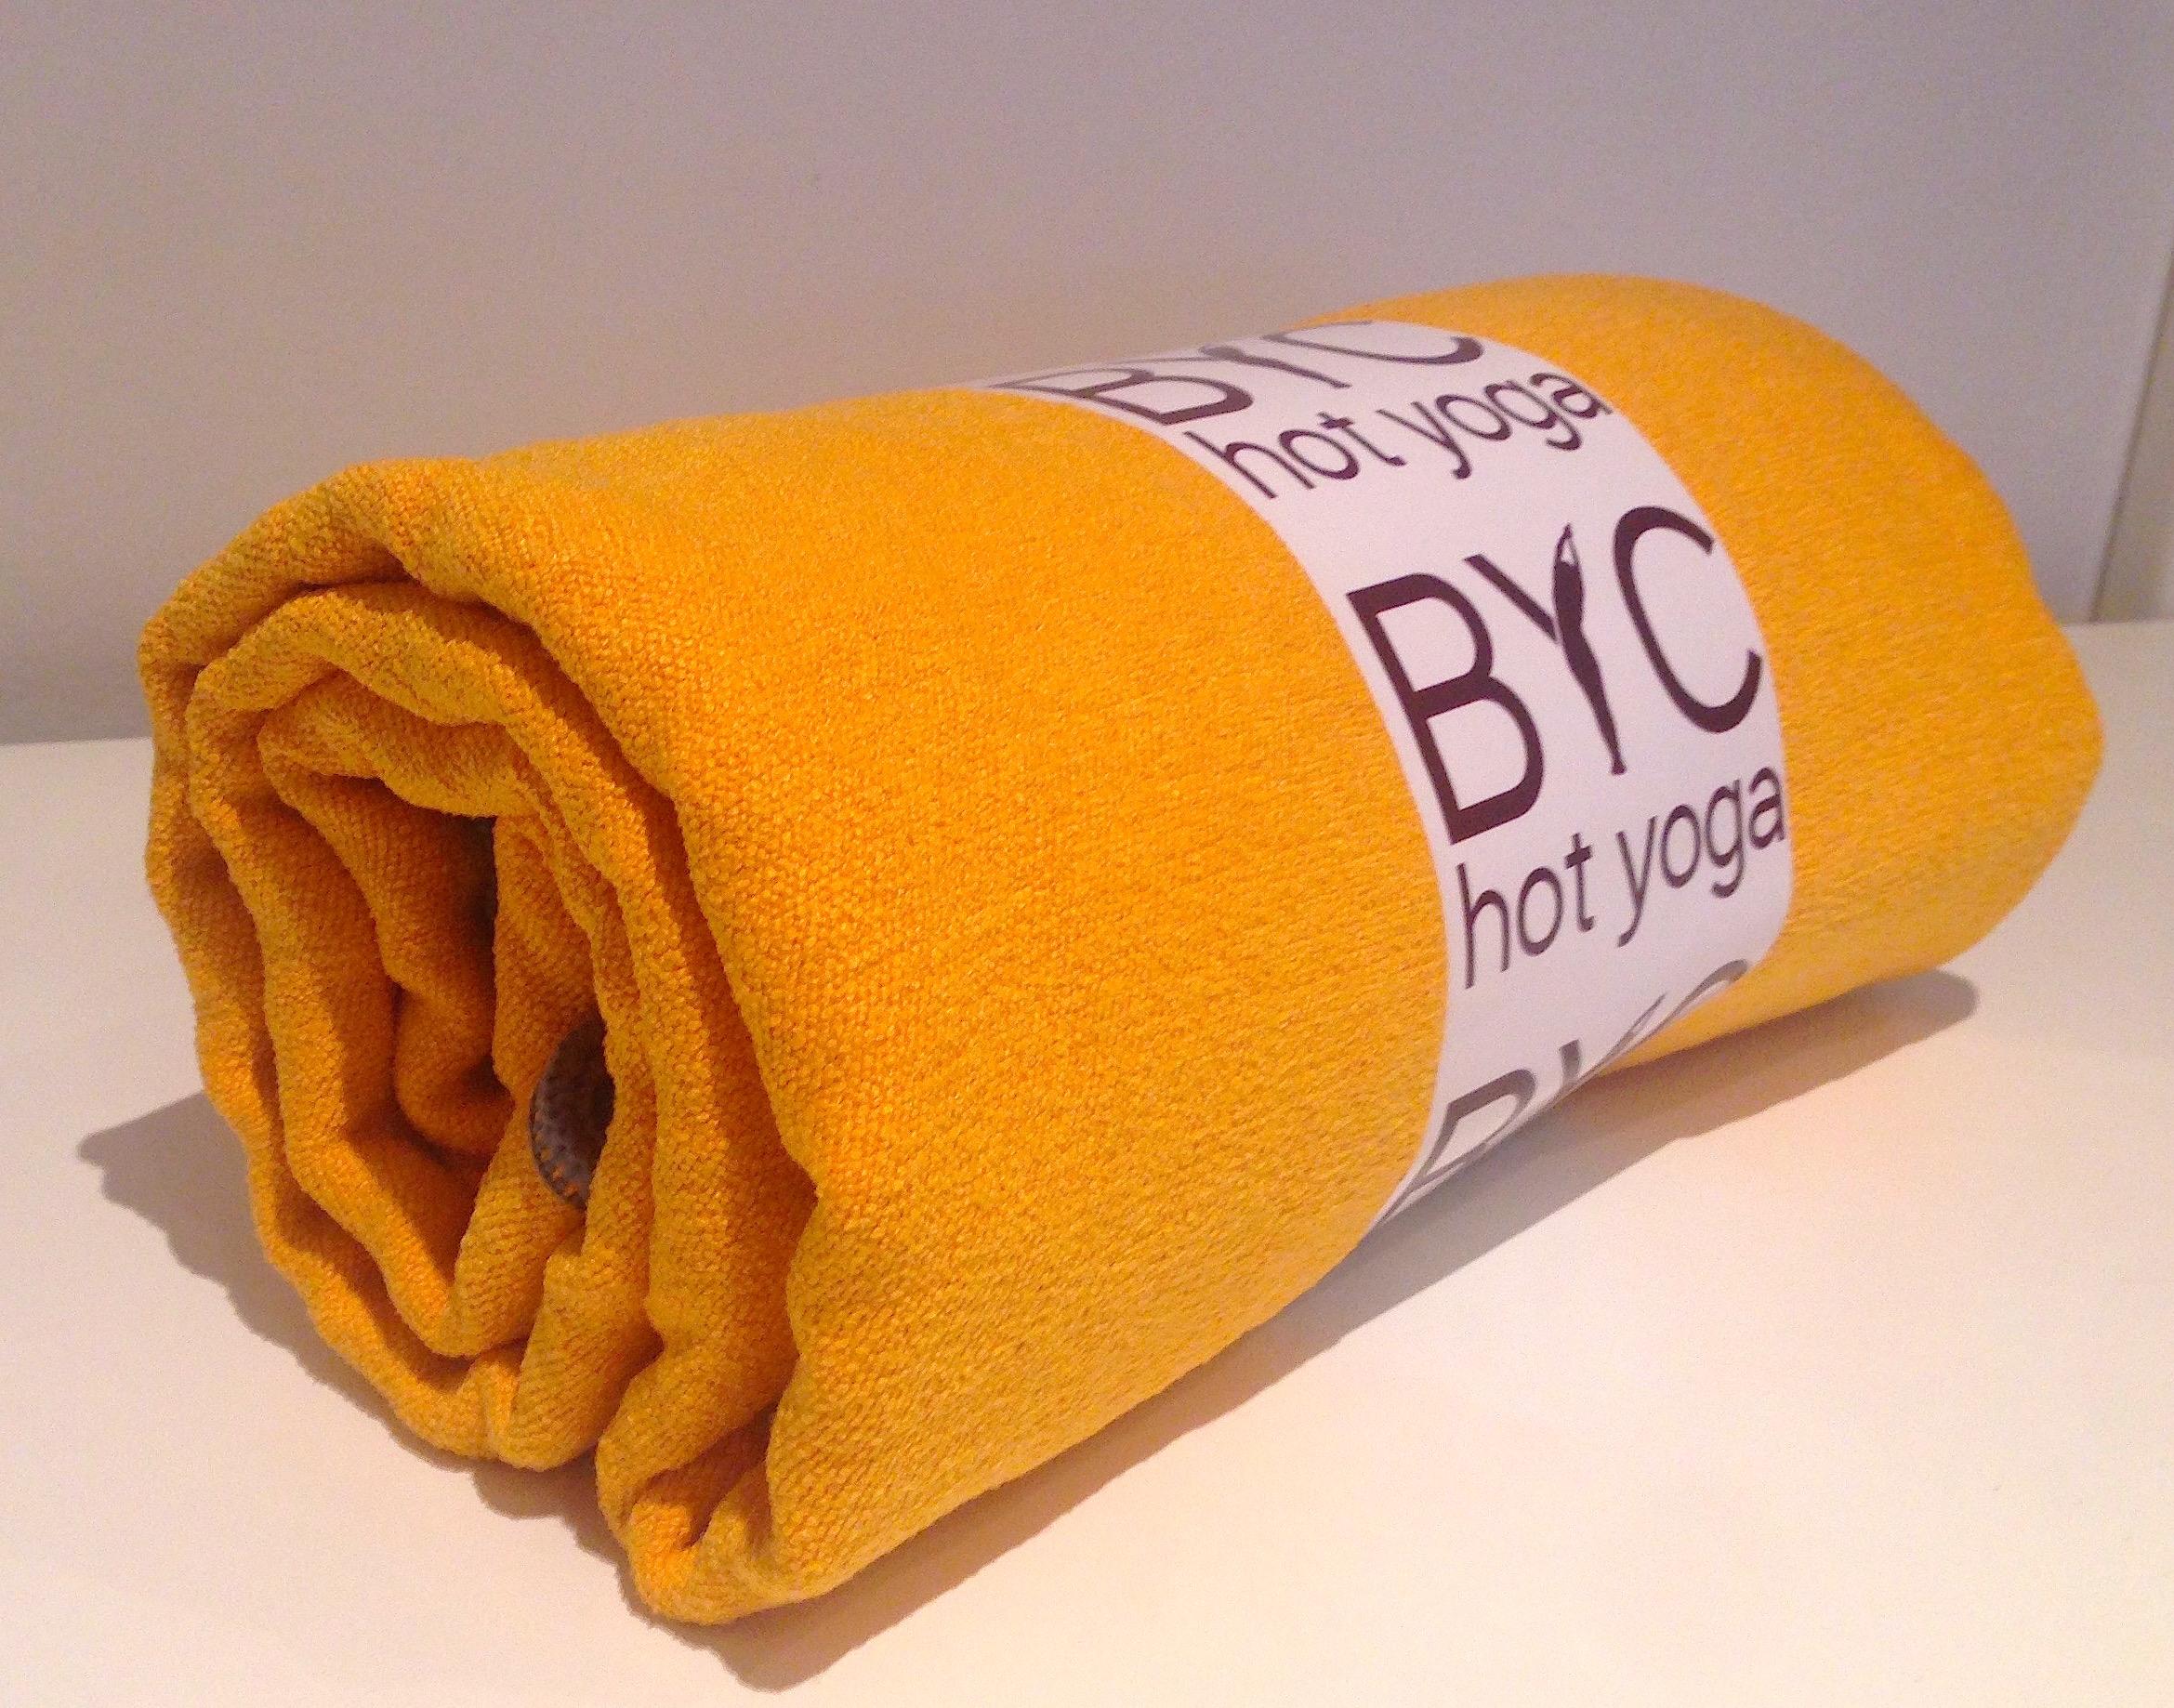 mat towel manduka sattva equa yoga en chamonix product mats towels